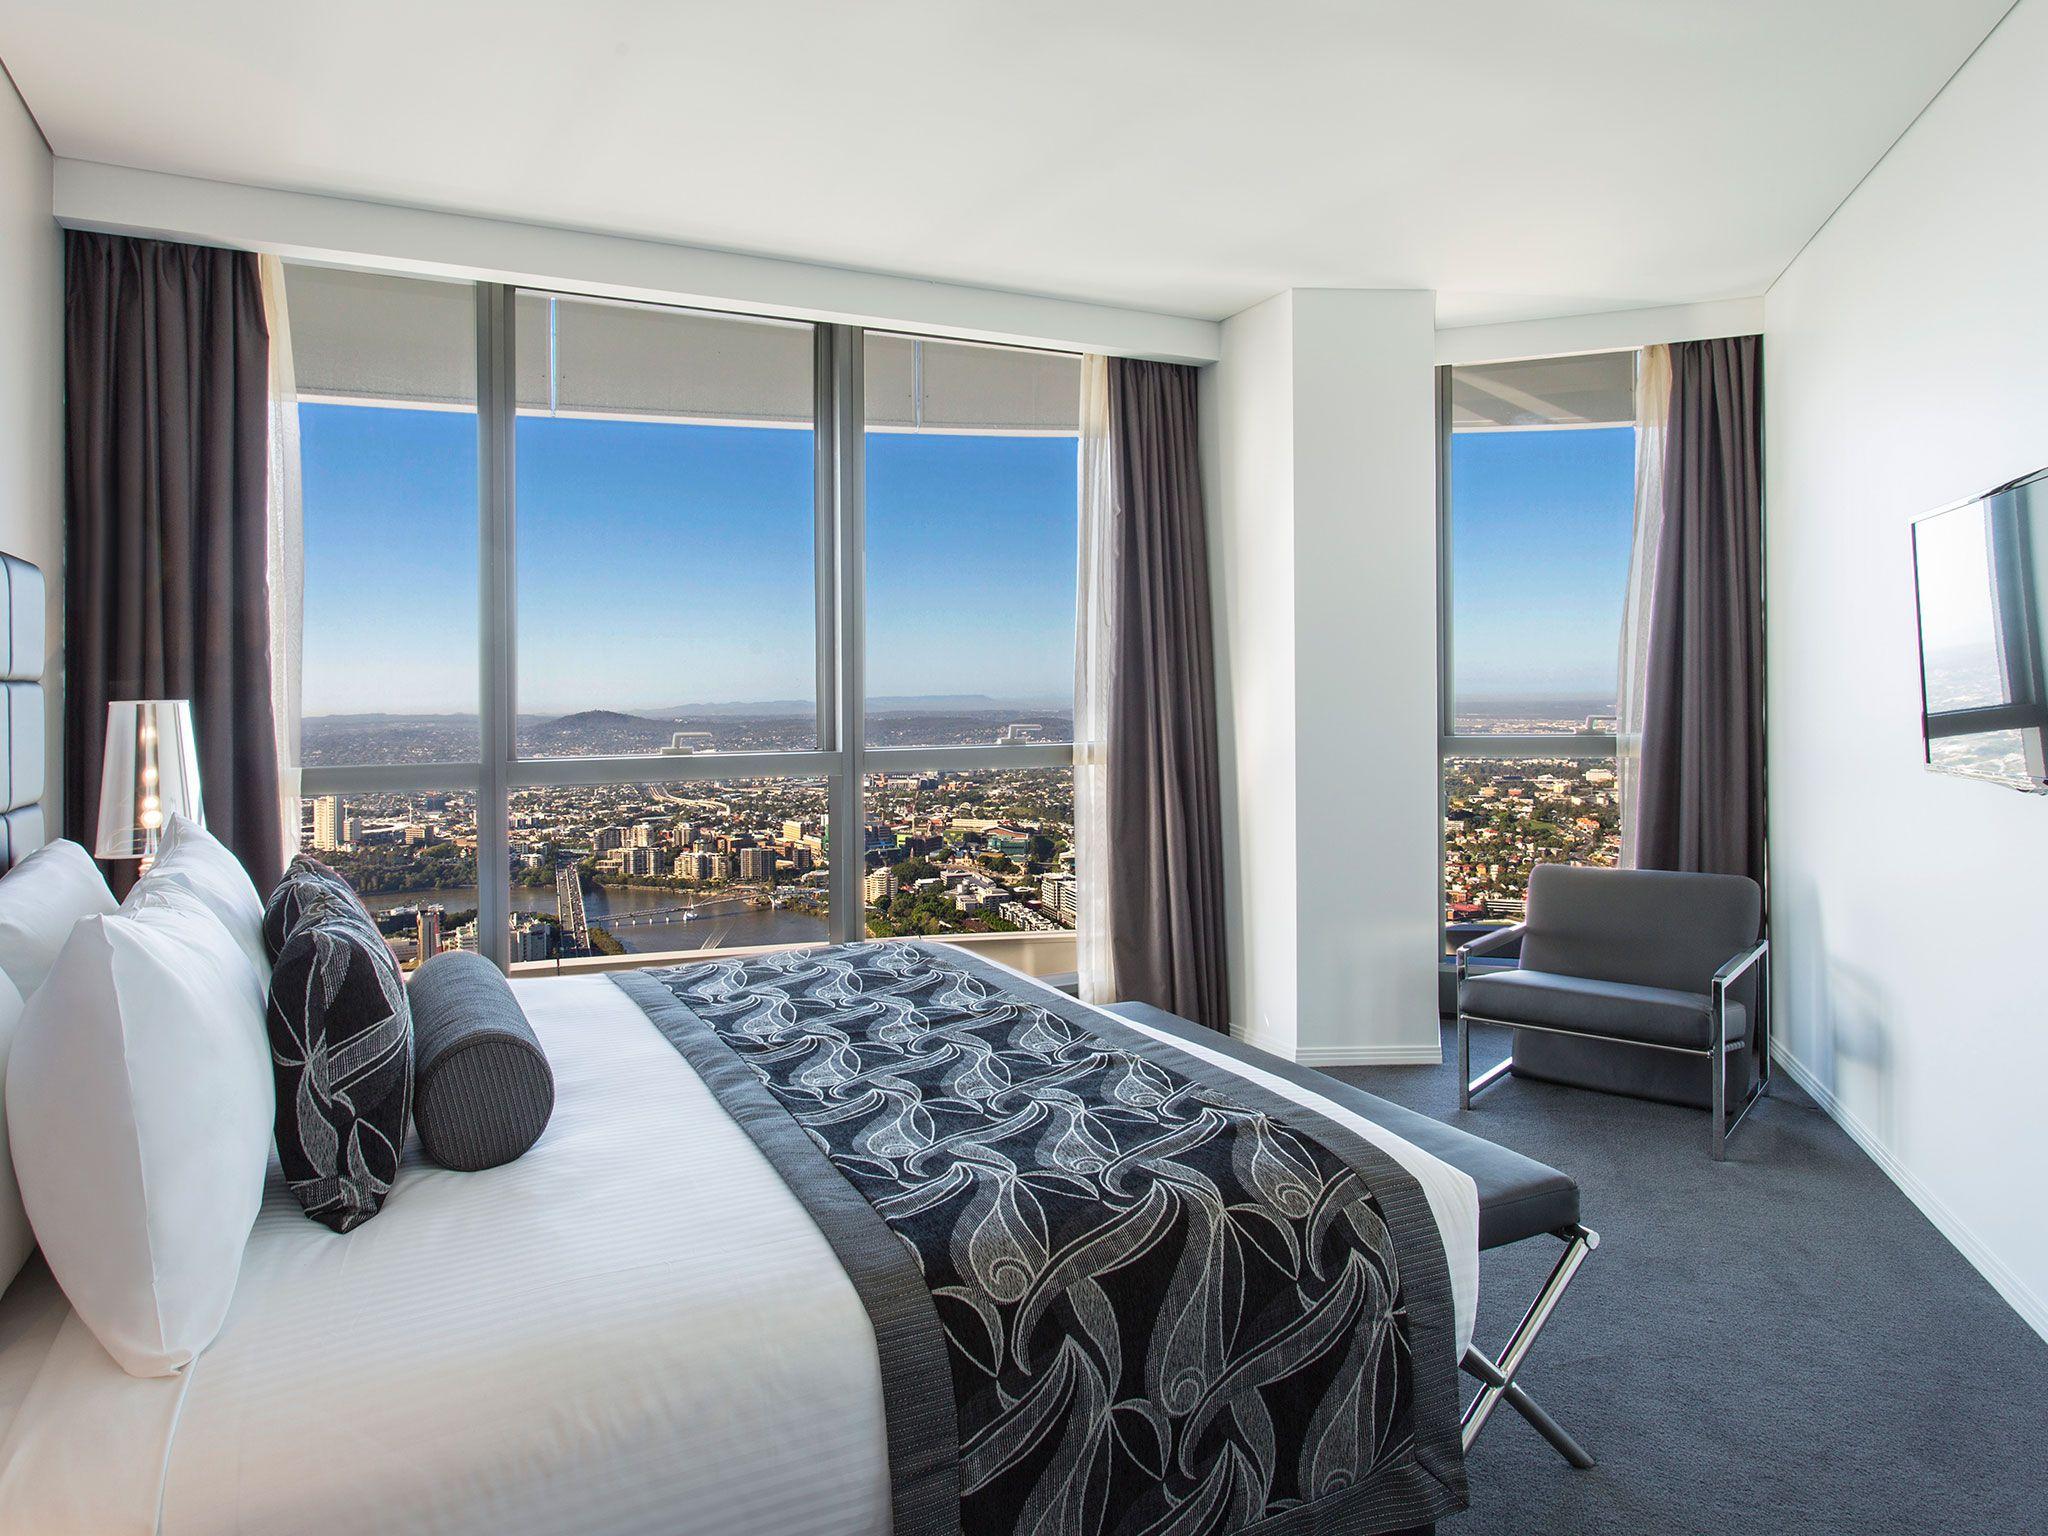 3 bedroom #penthouse apartment #meriton #luxury #hotel #brisbane